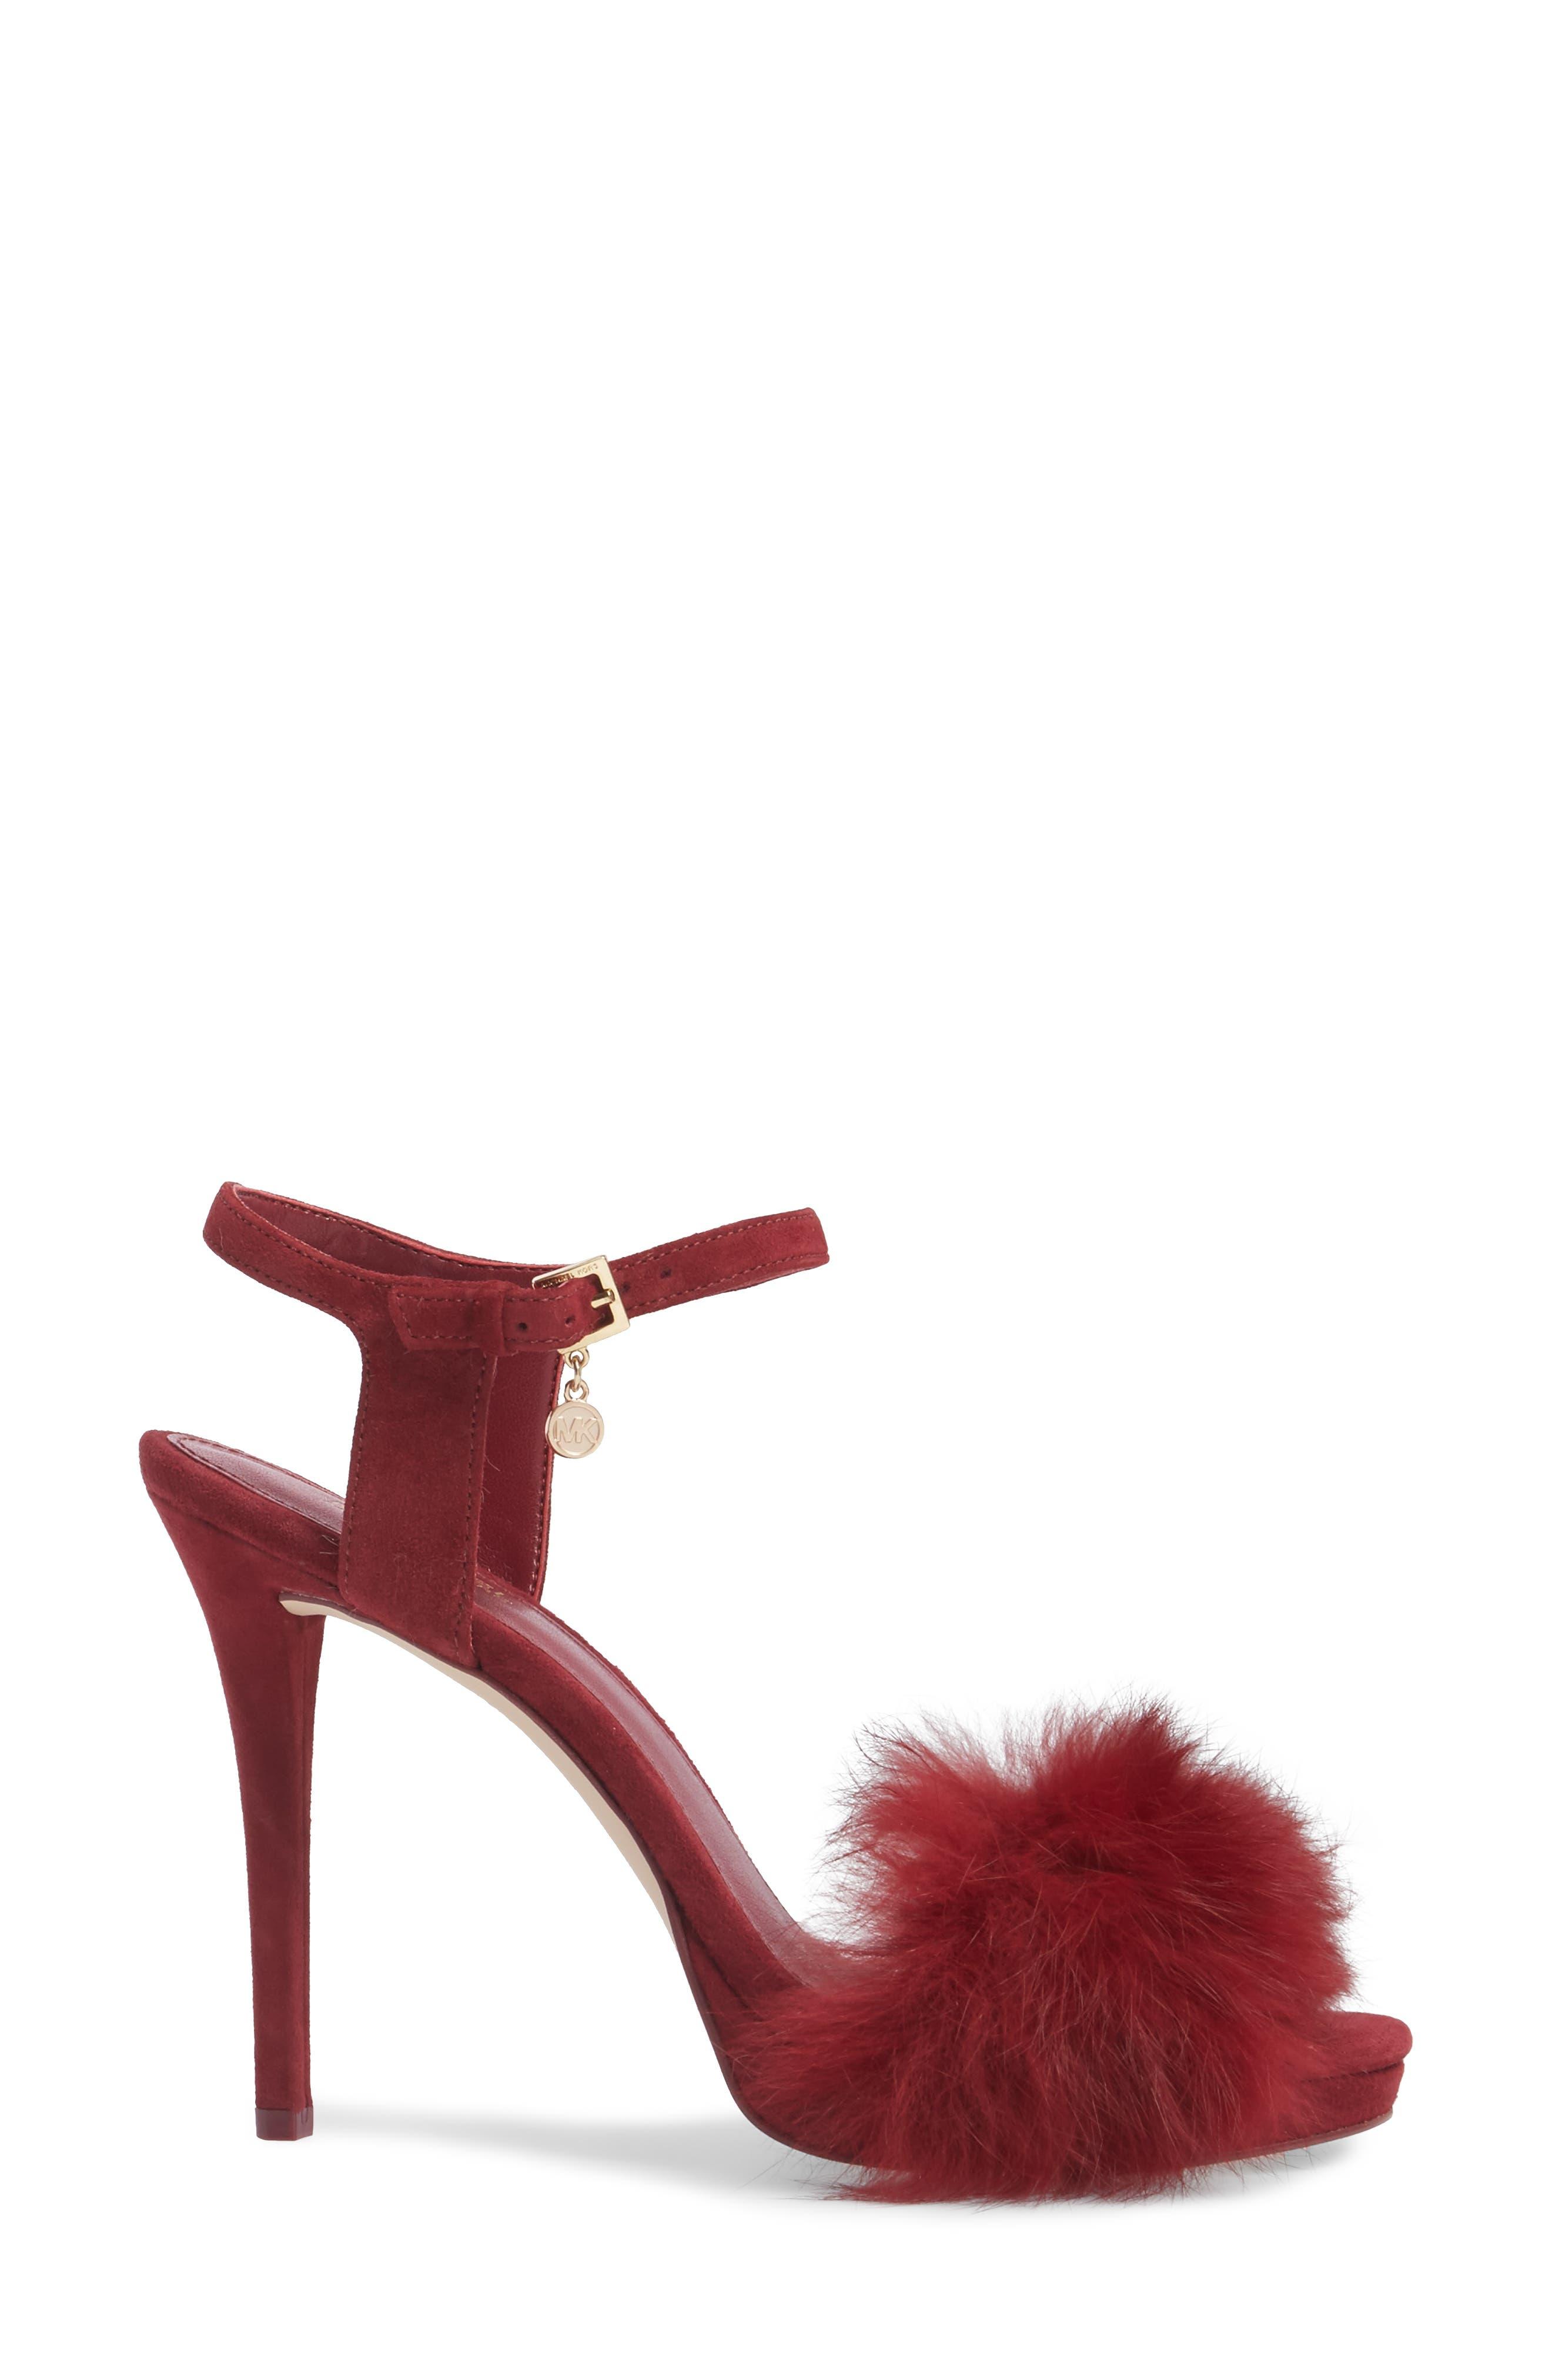 Faye Genuine Rabbit Fur Sandal,                             Alternate thumbnail 3, color,                             Mulberry Suede/ Fur